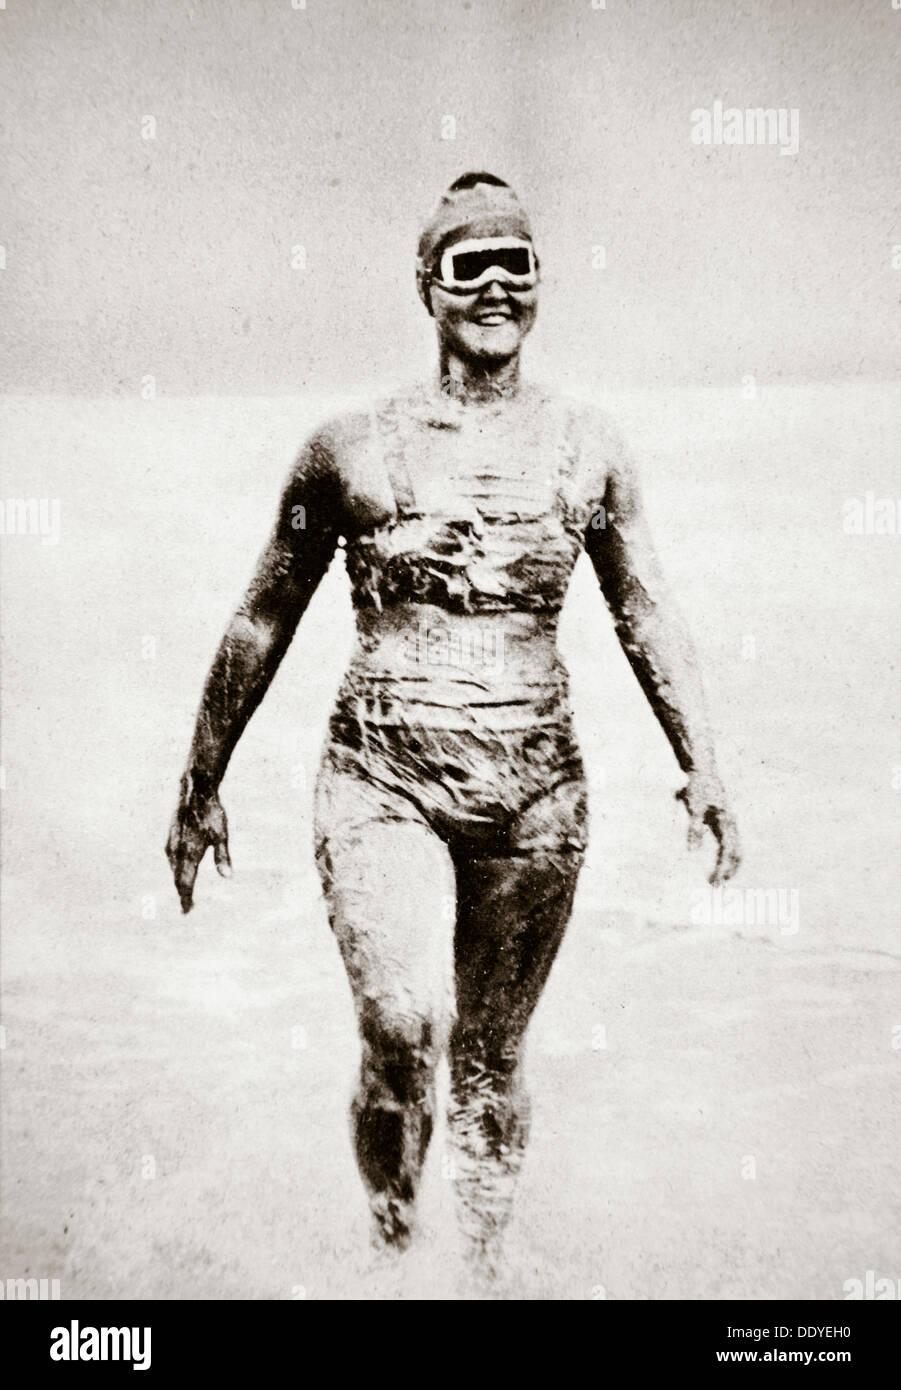 Gertrude Ederle, nageur américain, 1926. Artiste: Inconnu Photo Stock